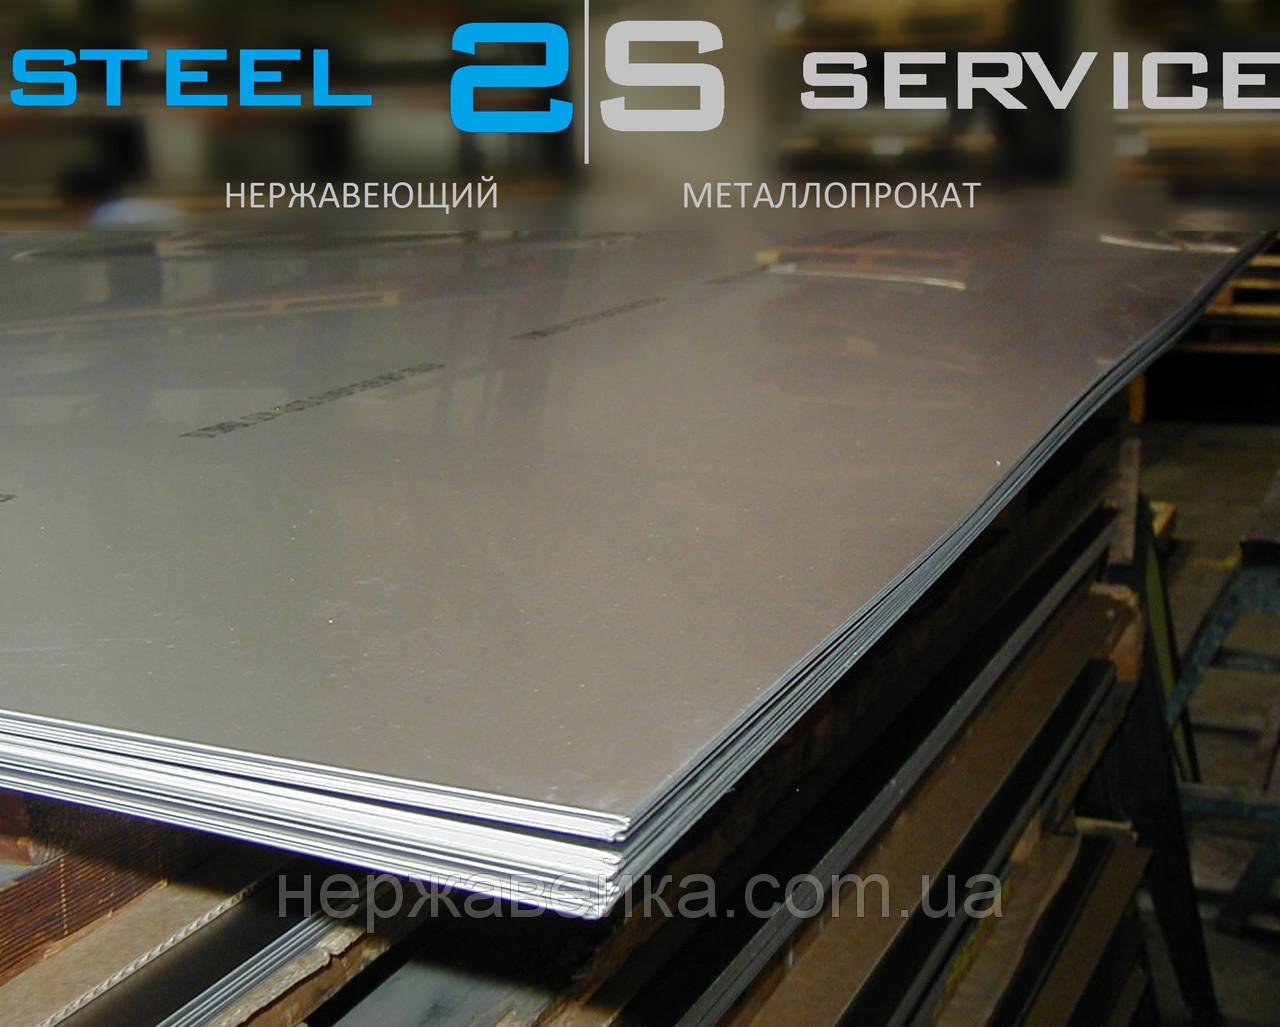 Нержавеющий лист 0,4х1250х2500мм AISI 316L(03Х17Н14М3) 4N - шлифованный, кислотостойкий